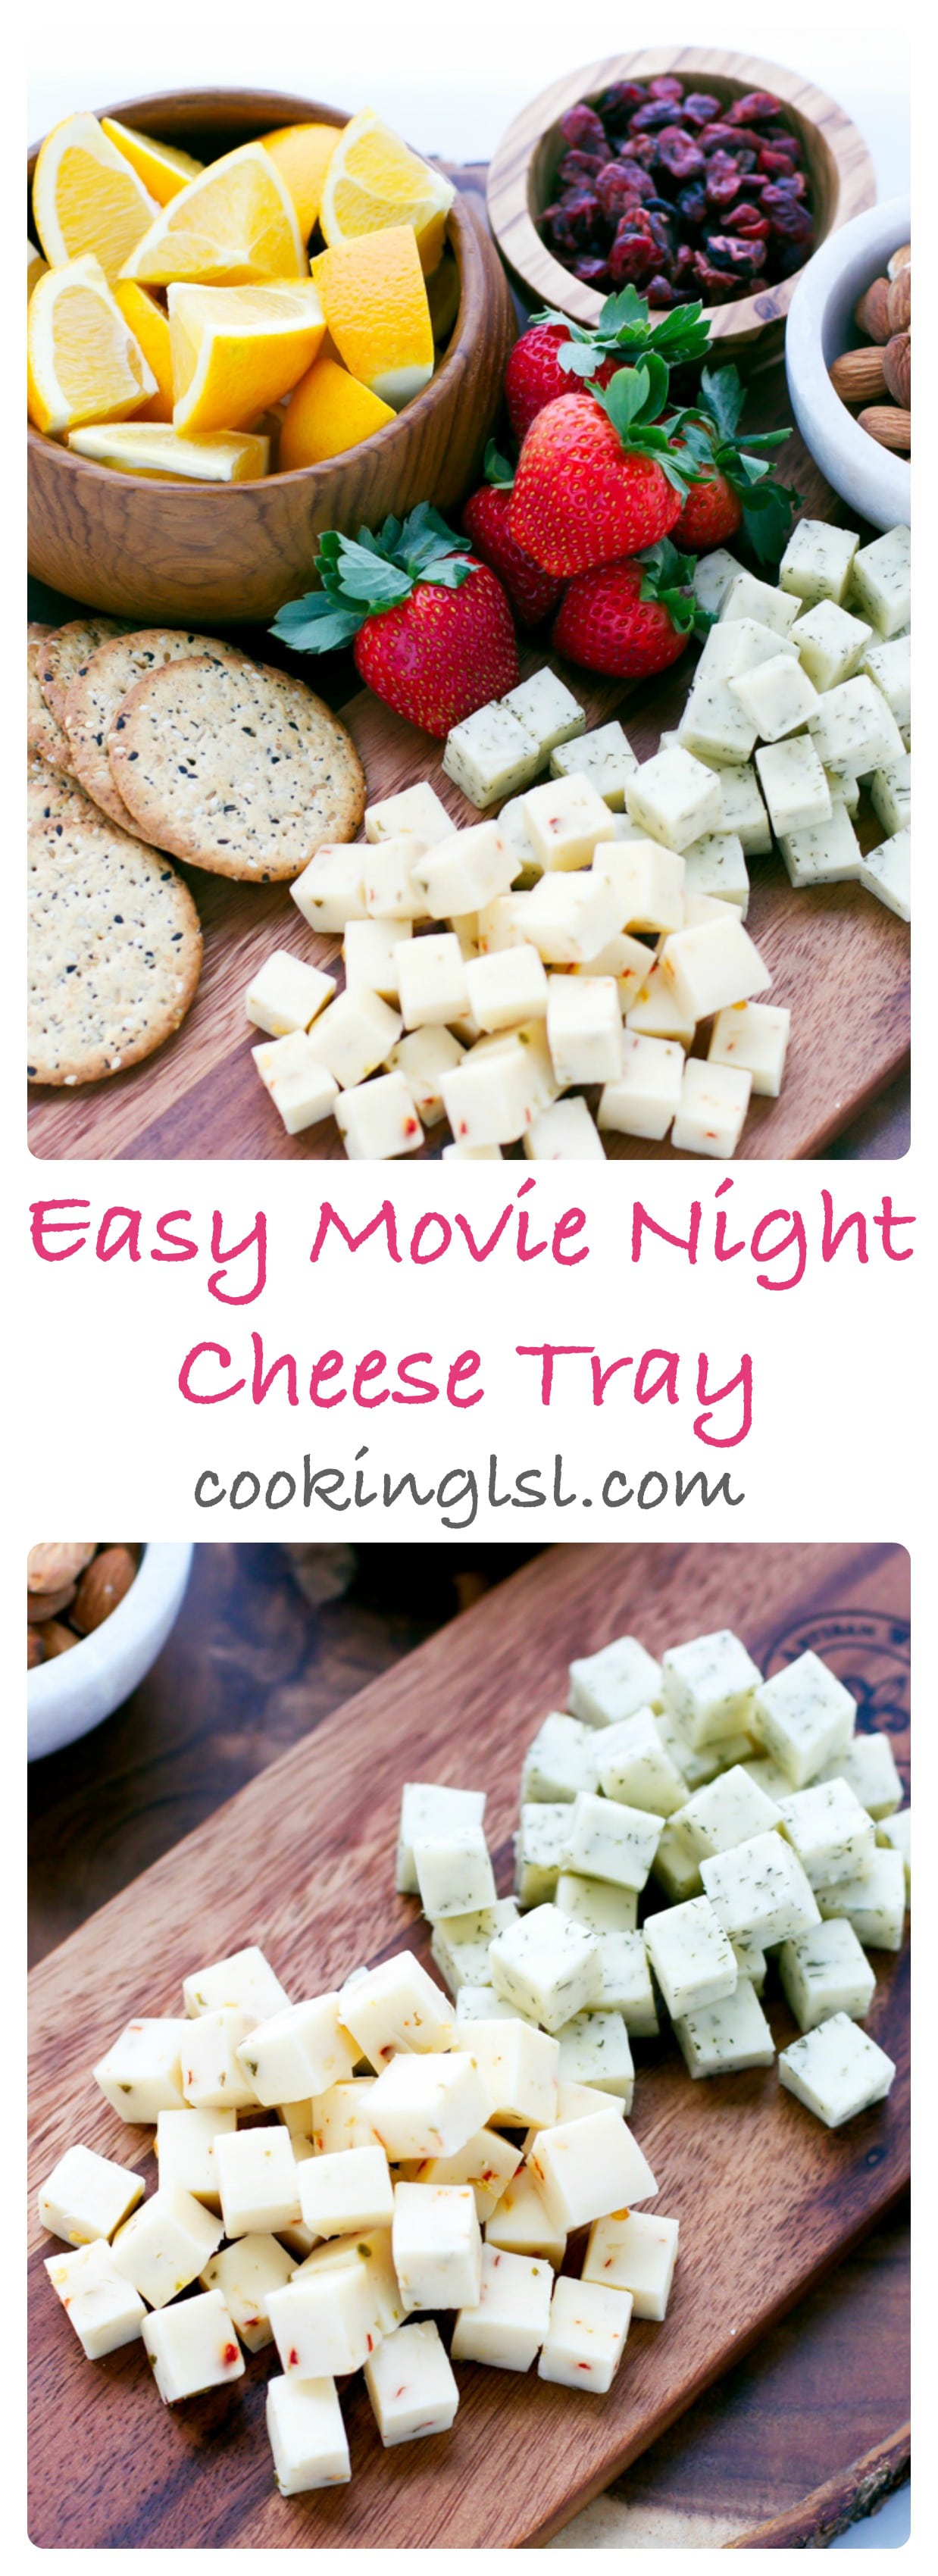 burnt-movie-night-cheese-tray-how-to-make